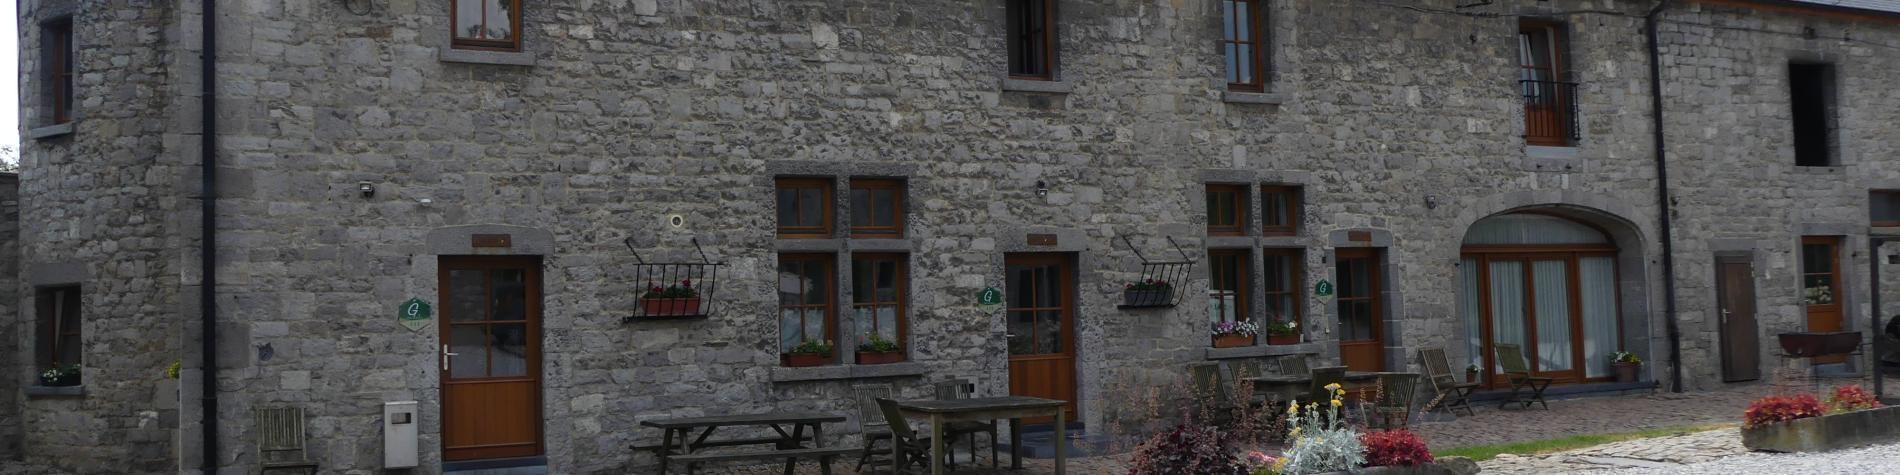 Gîtes Ferme-château Laneffe – Walcourt